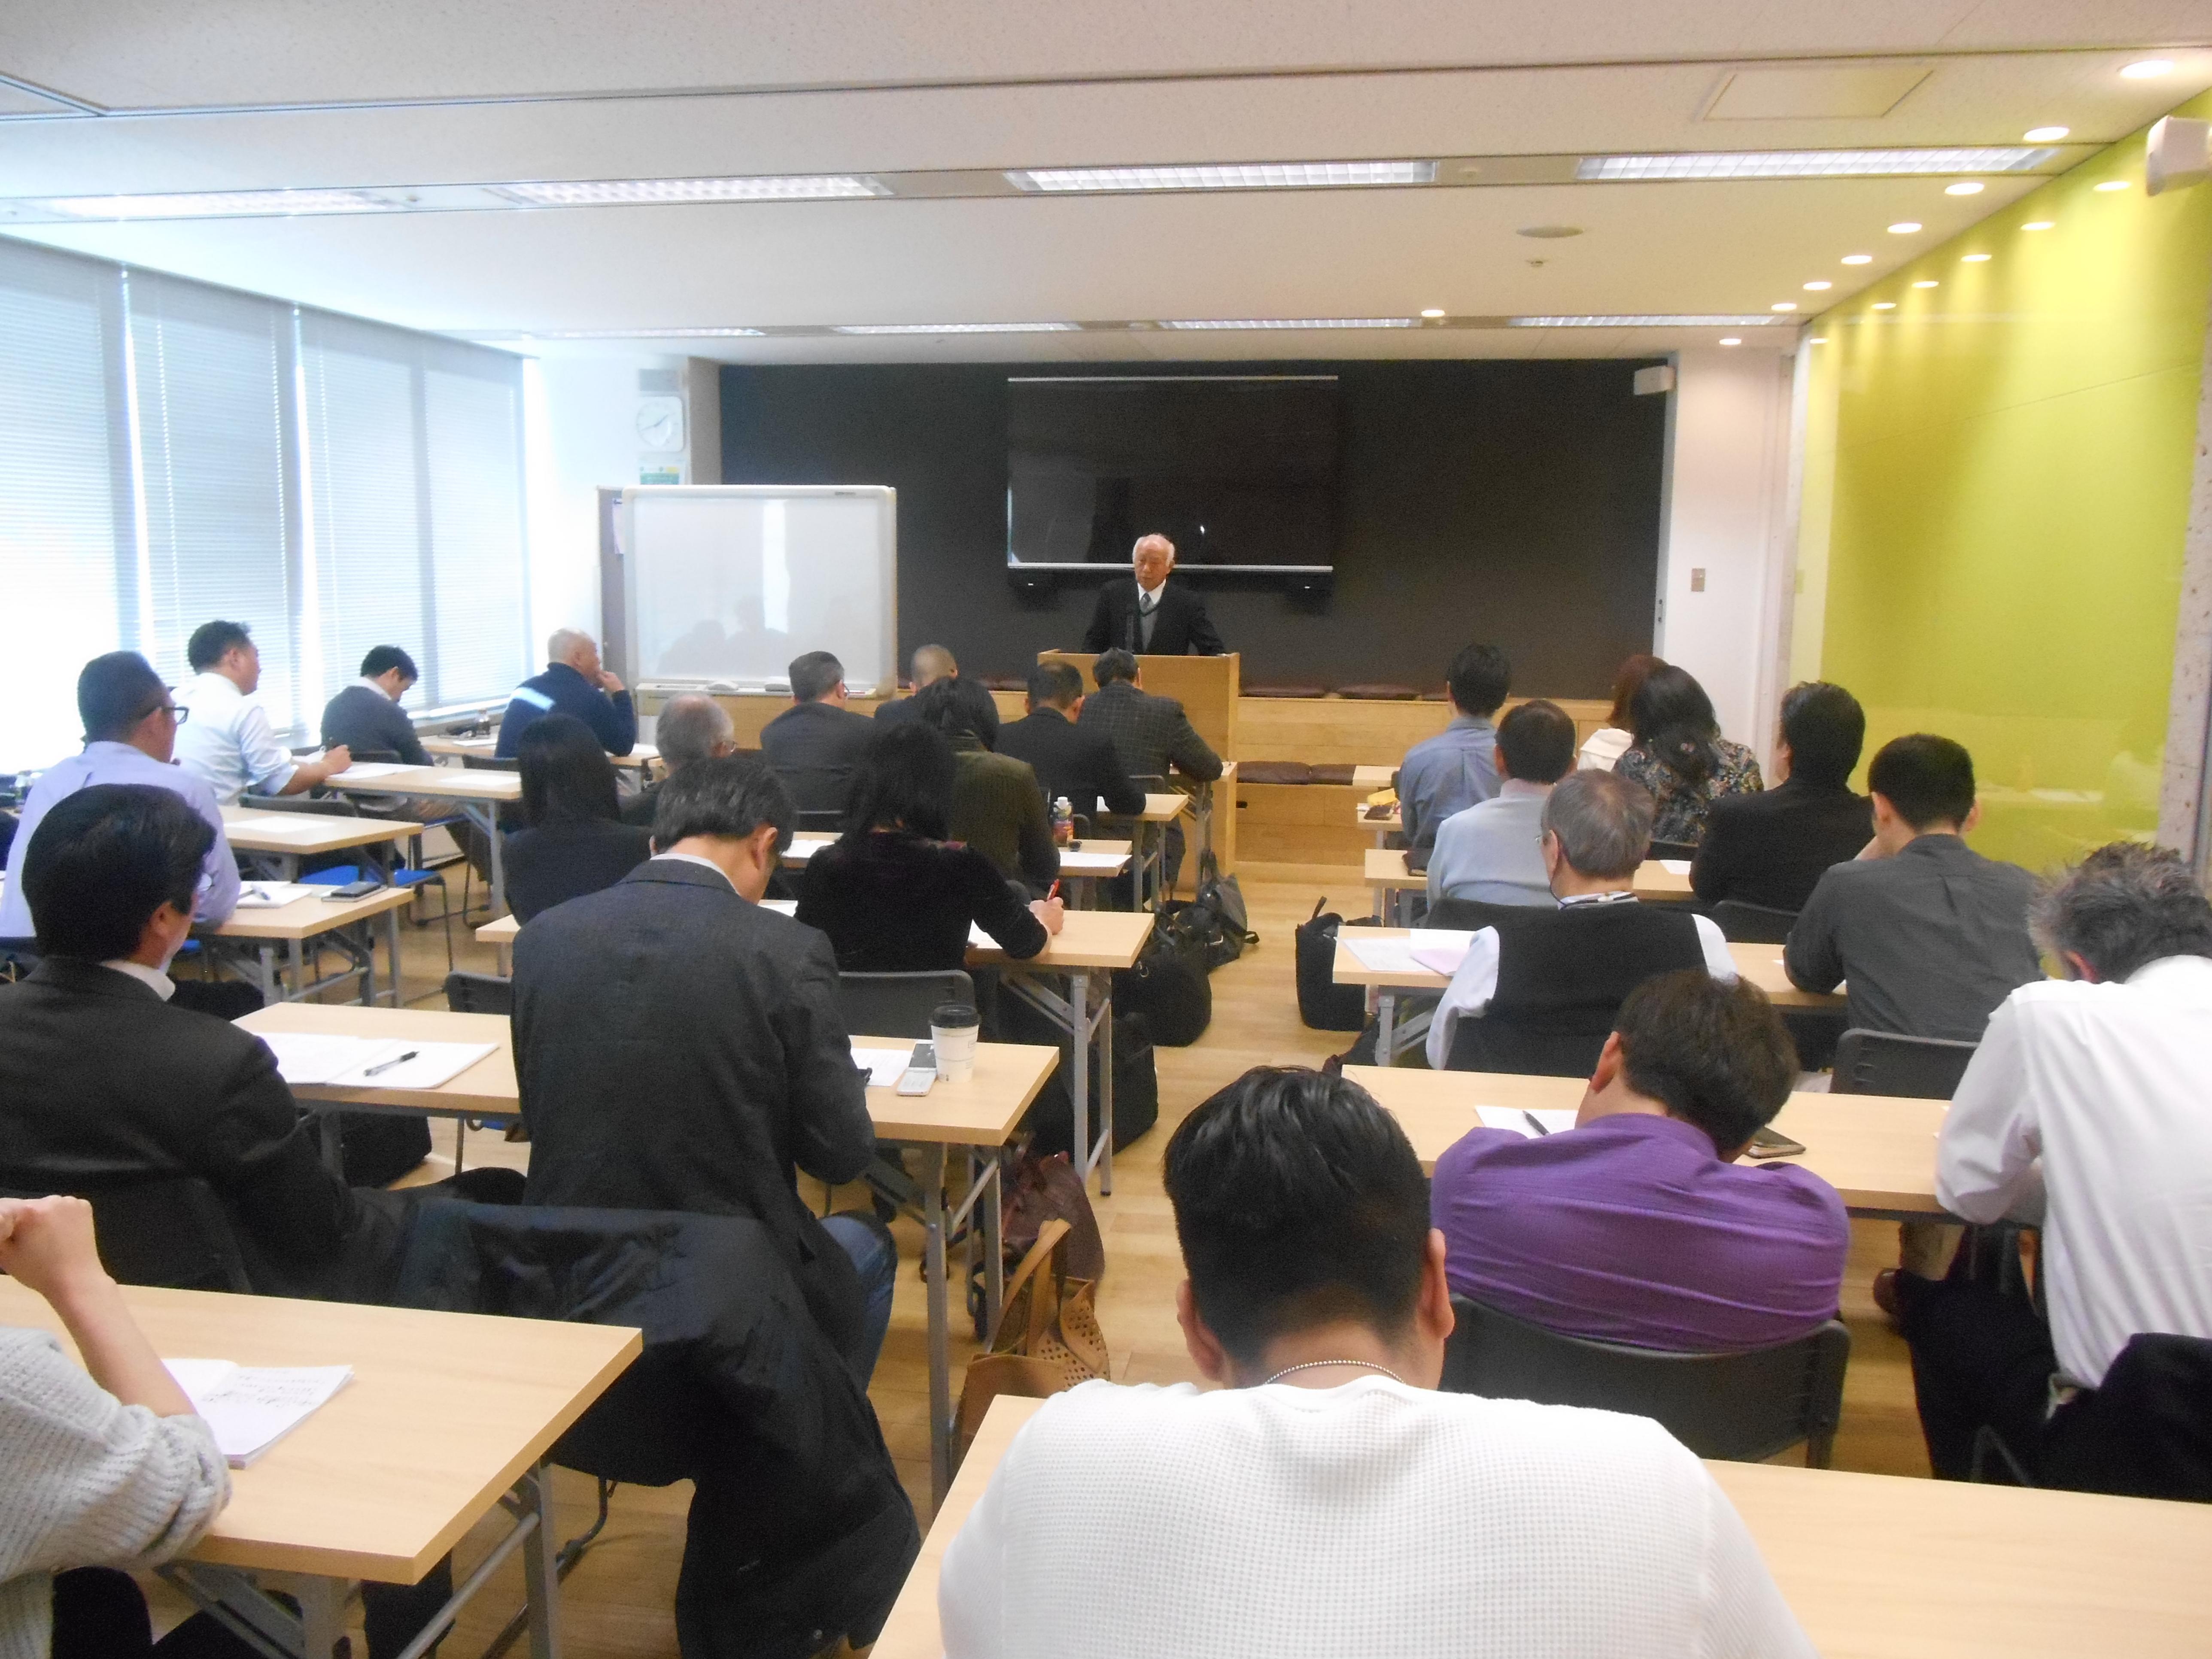 DSCN0043 - 4月1日東京思風塾の開催になります。